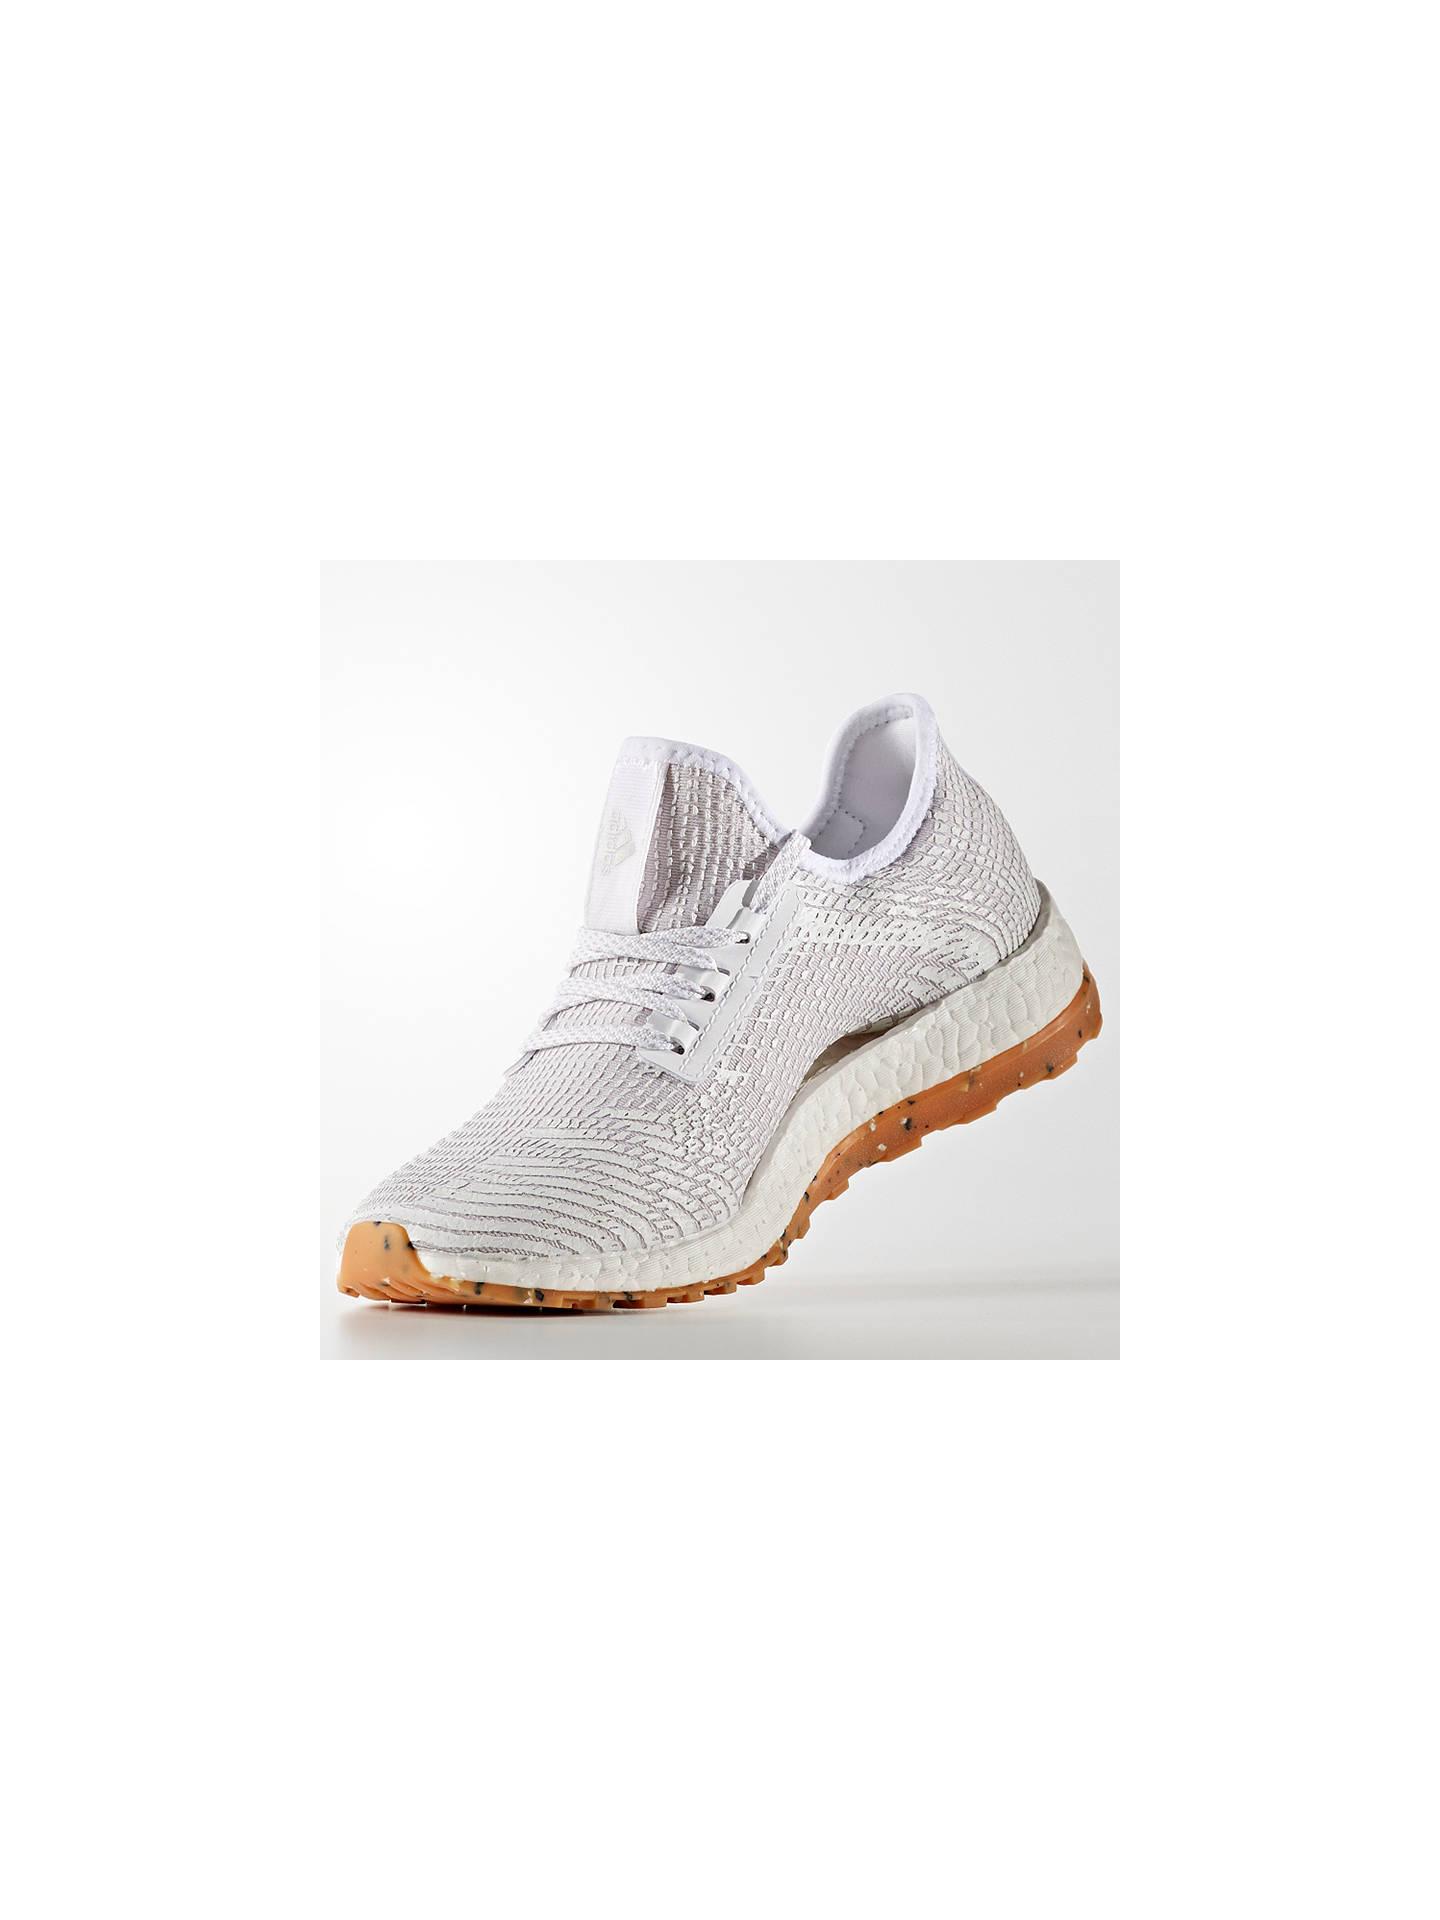 bf8123f6caa424 ... new style buyadidas pureboost all terrain womens running shoes crystal  white pearl grey 4 3fdb3 62a5e